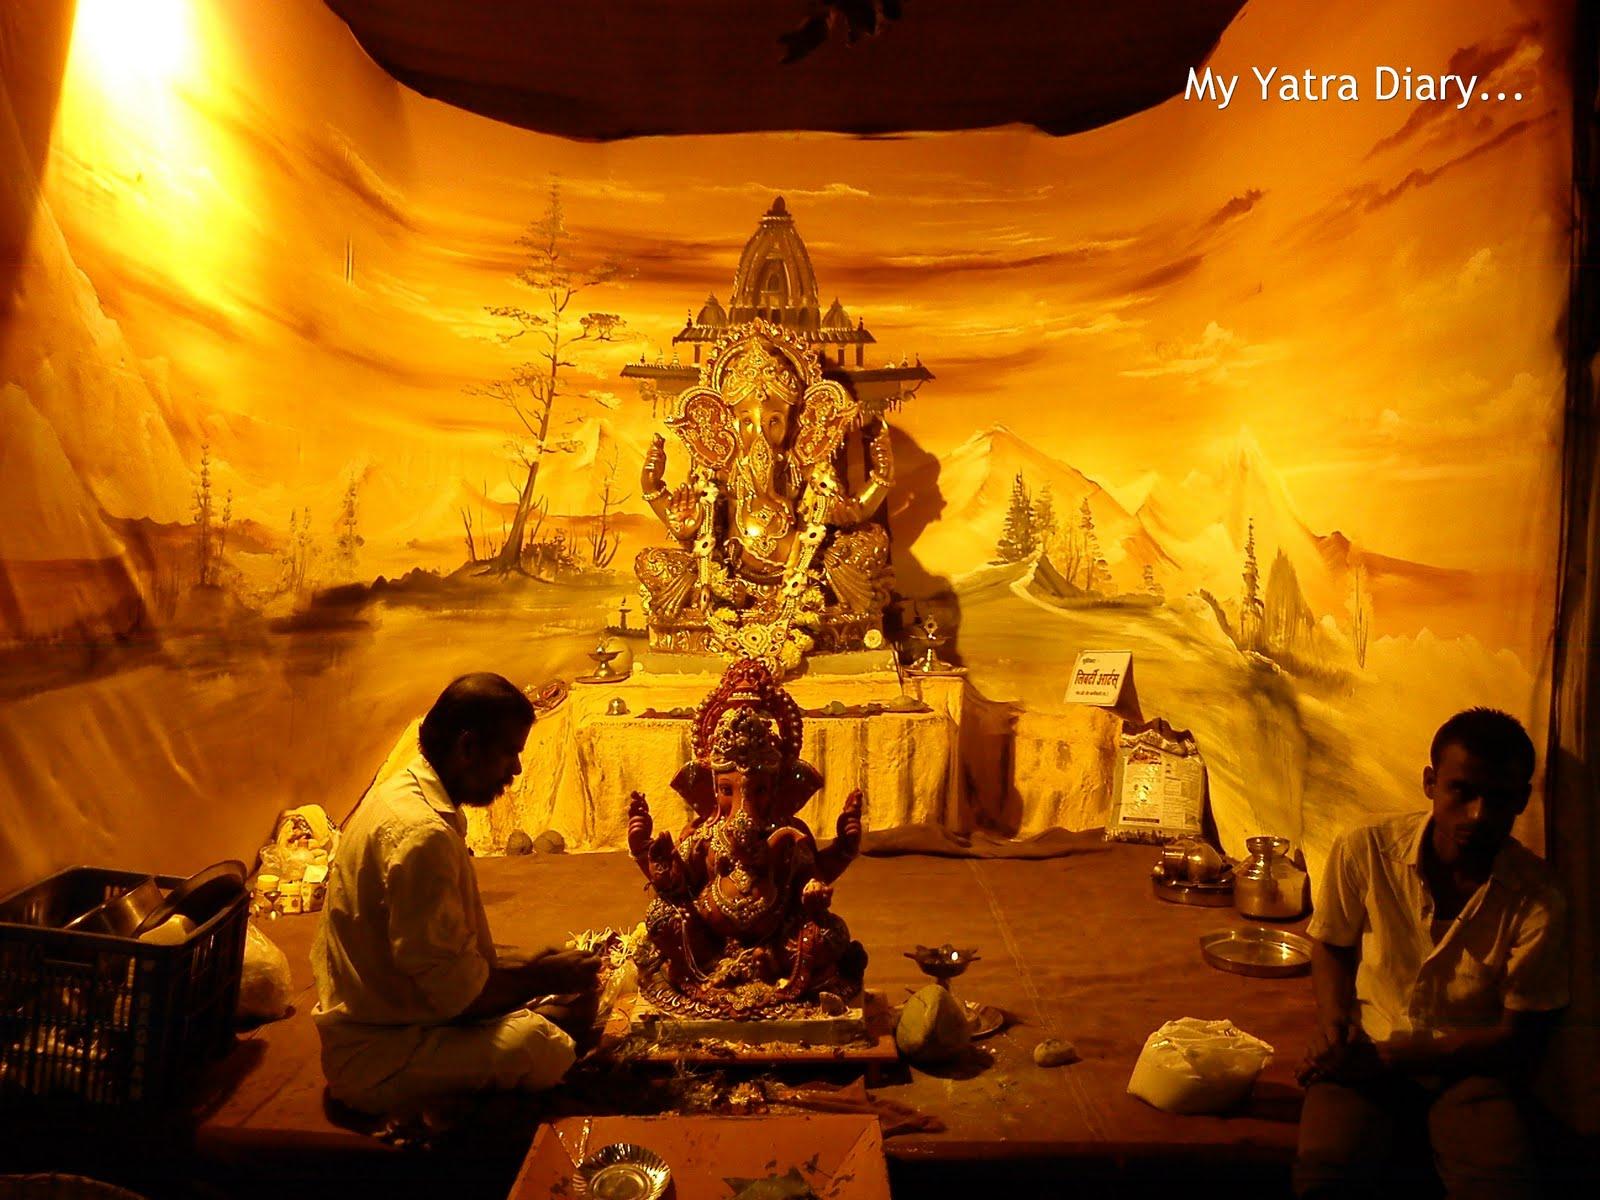 My Yatra Diary: Festive colors of Ganesh Chaturthi - Ganpati